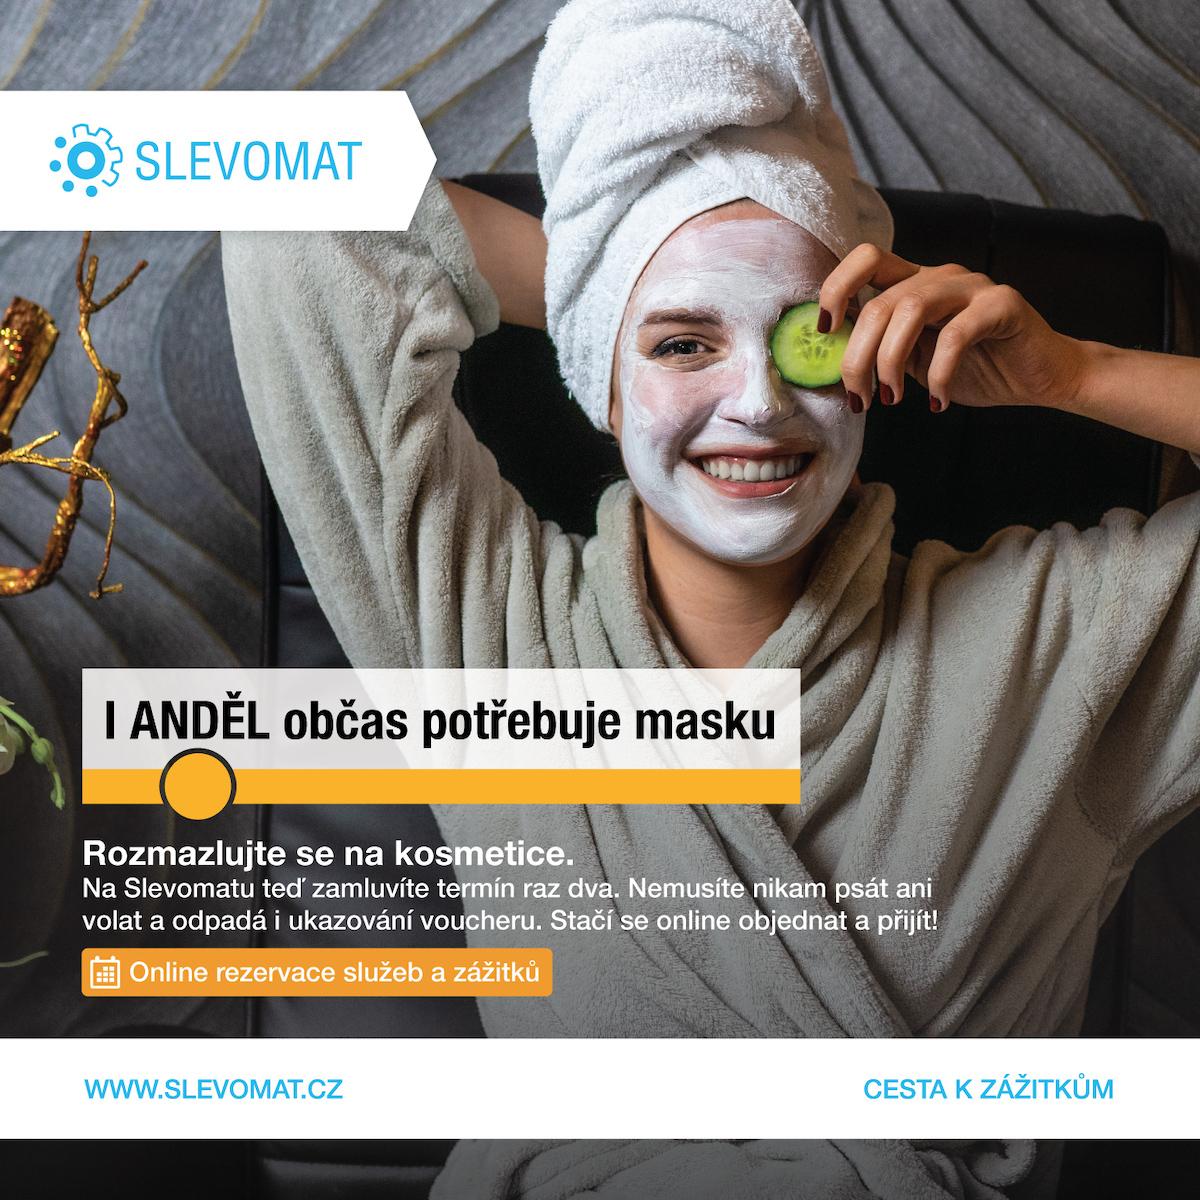 Kampaň Slevomatu v pražském metru